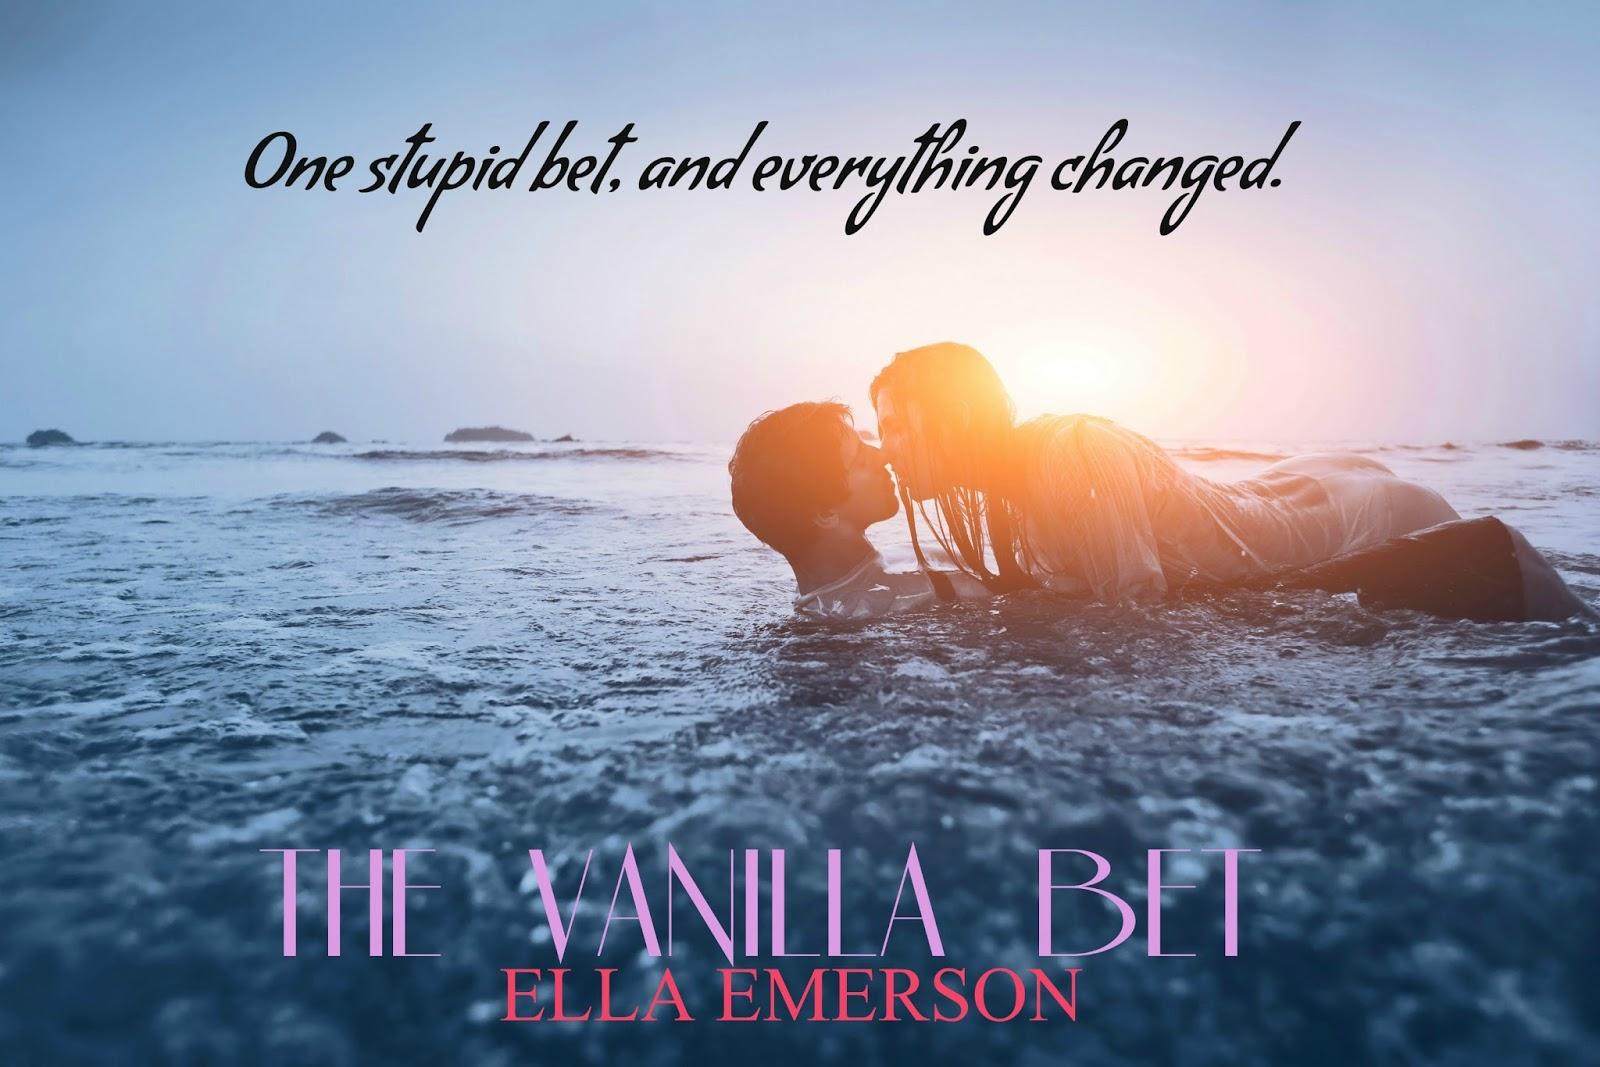 Ella emerson goodreads giveaways